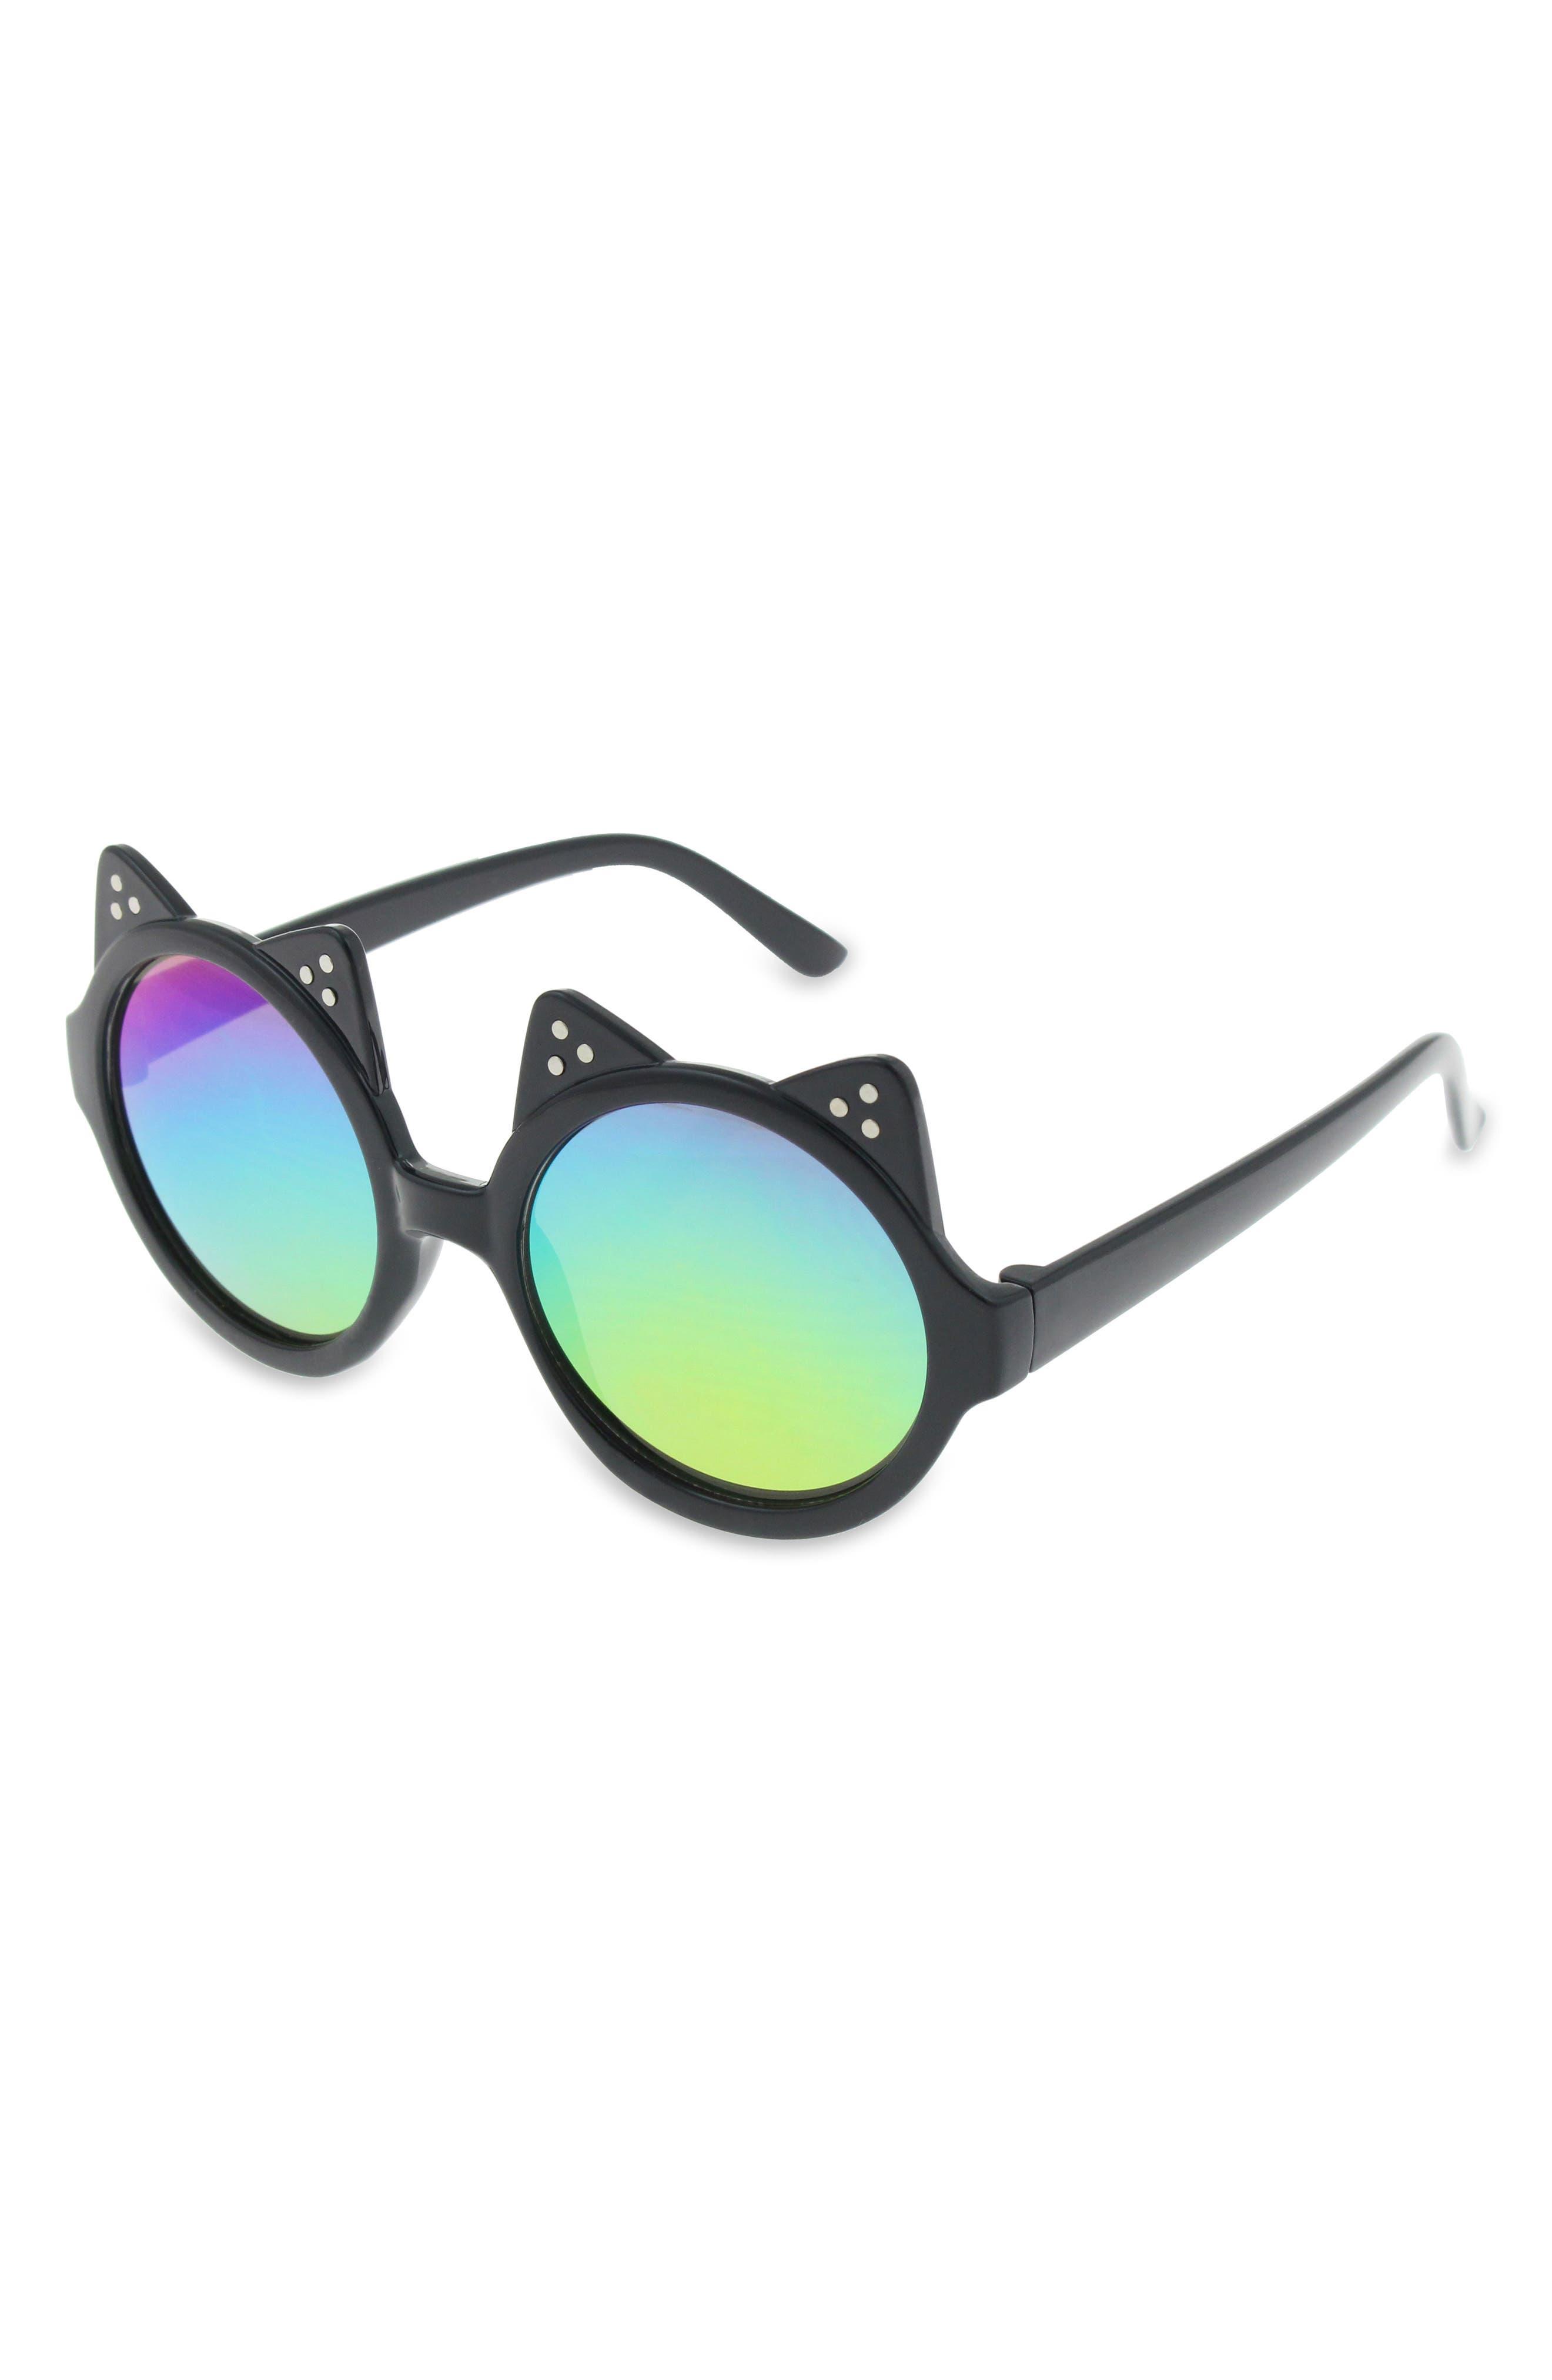 Double Cat Ear Sunglasses,                             Main thumbnail 1, color,                             Black